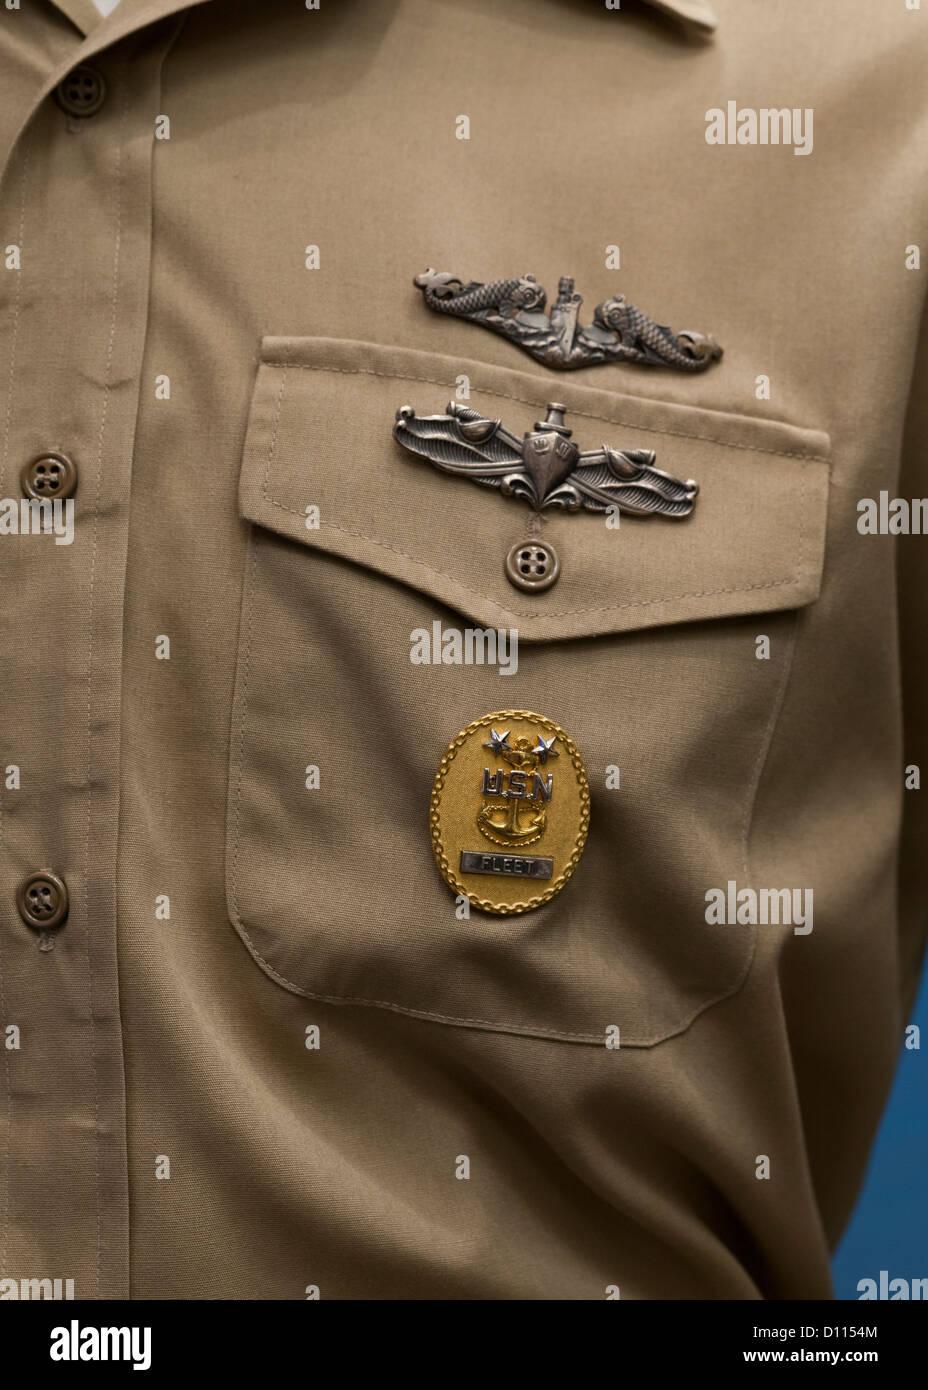 Navy officer medals on Service Dress Khaki Uniform - Stock Image